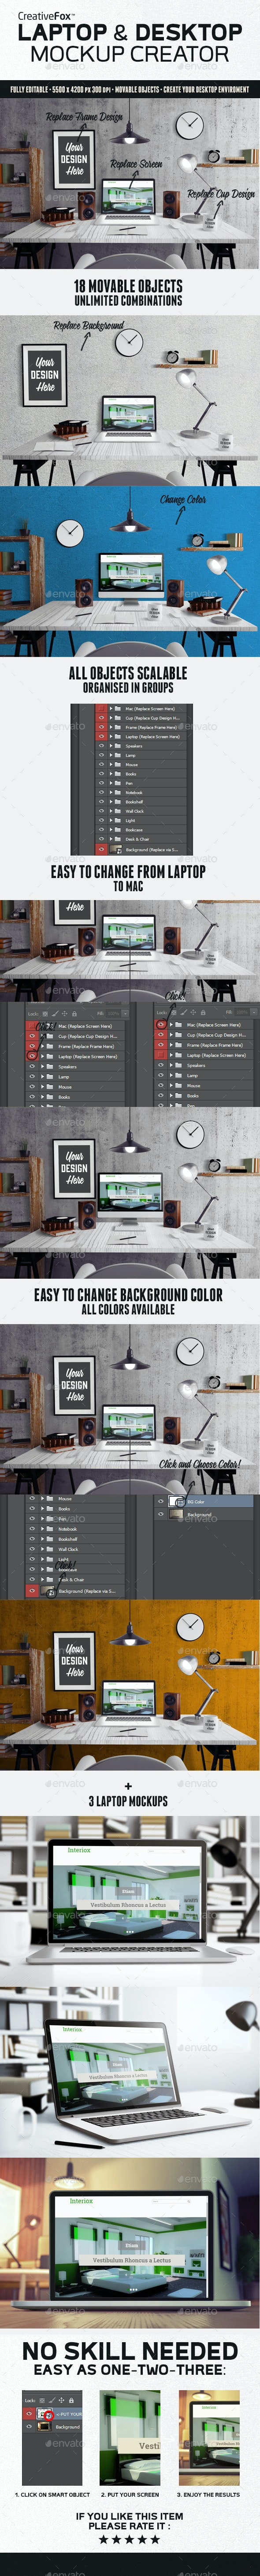 Laptop & Desktop Mockup Creator - Hero Images Graphics